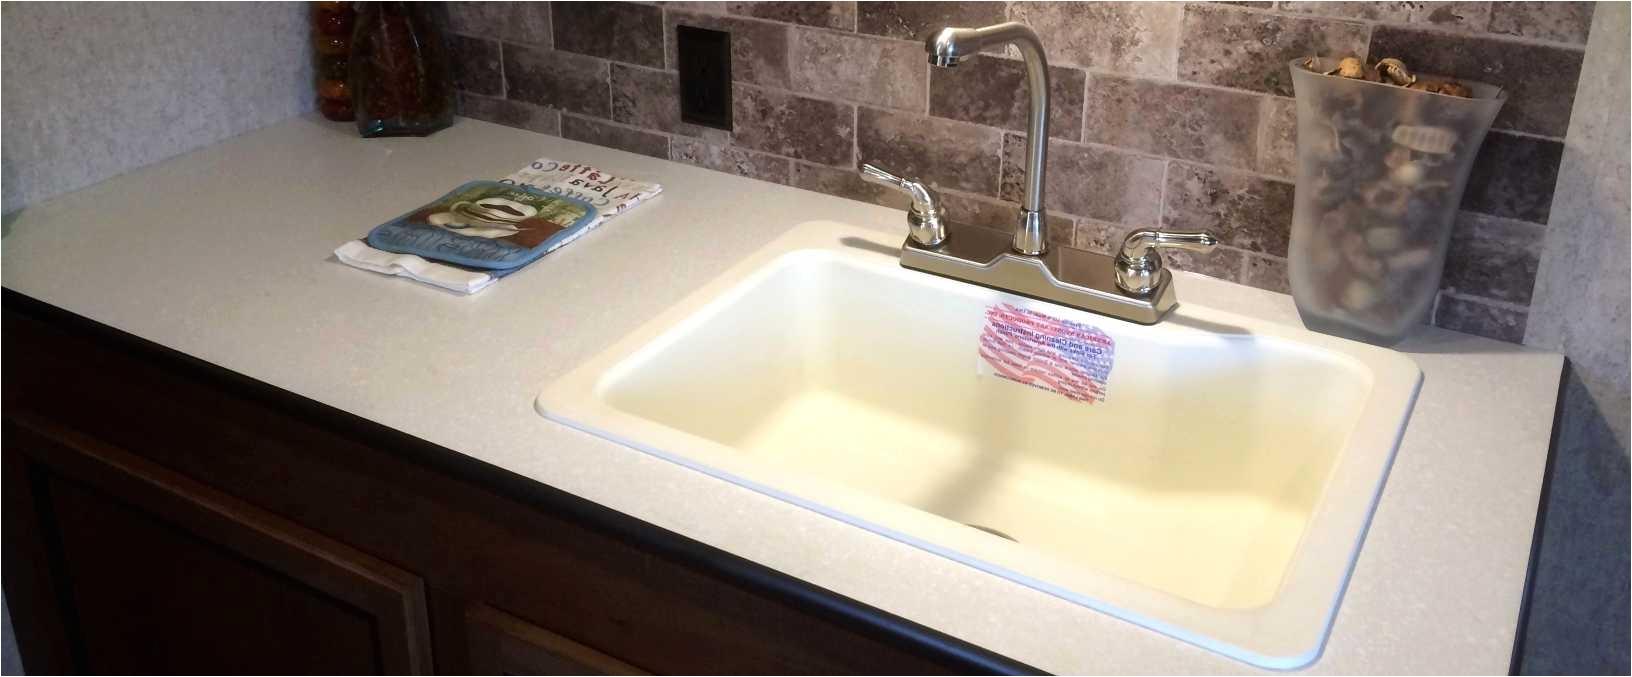 resurface bathroom sink new 51 elegant refinish kitchen sink elegant kitchen 2018 elegant of 15 lovely